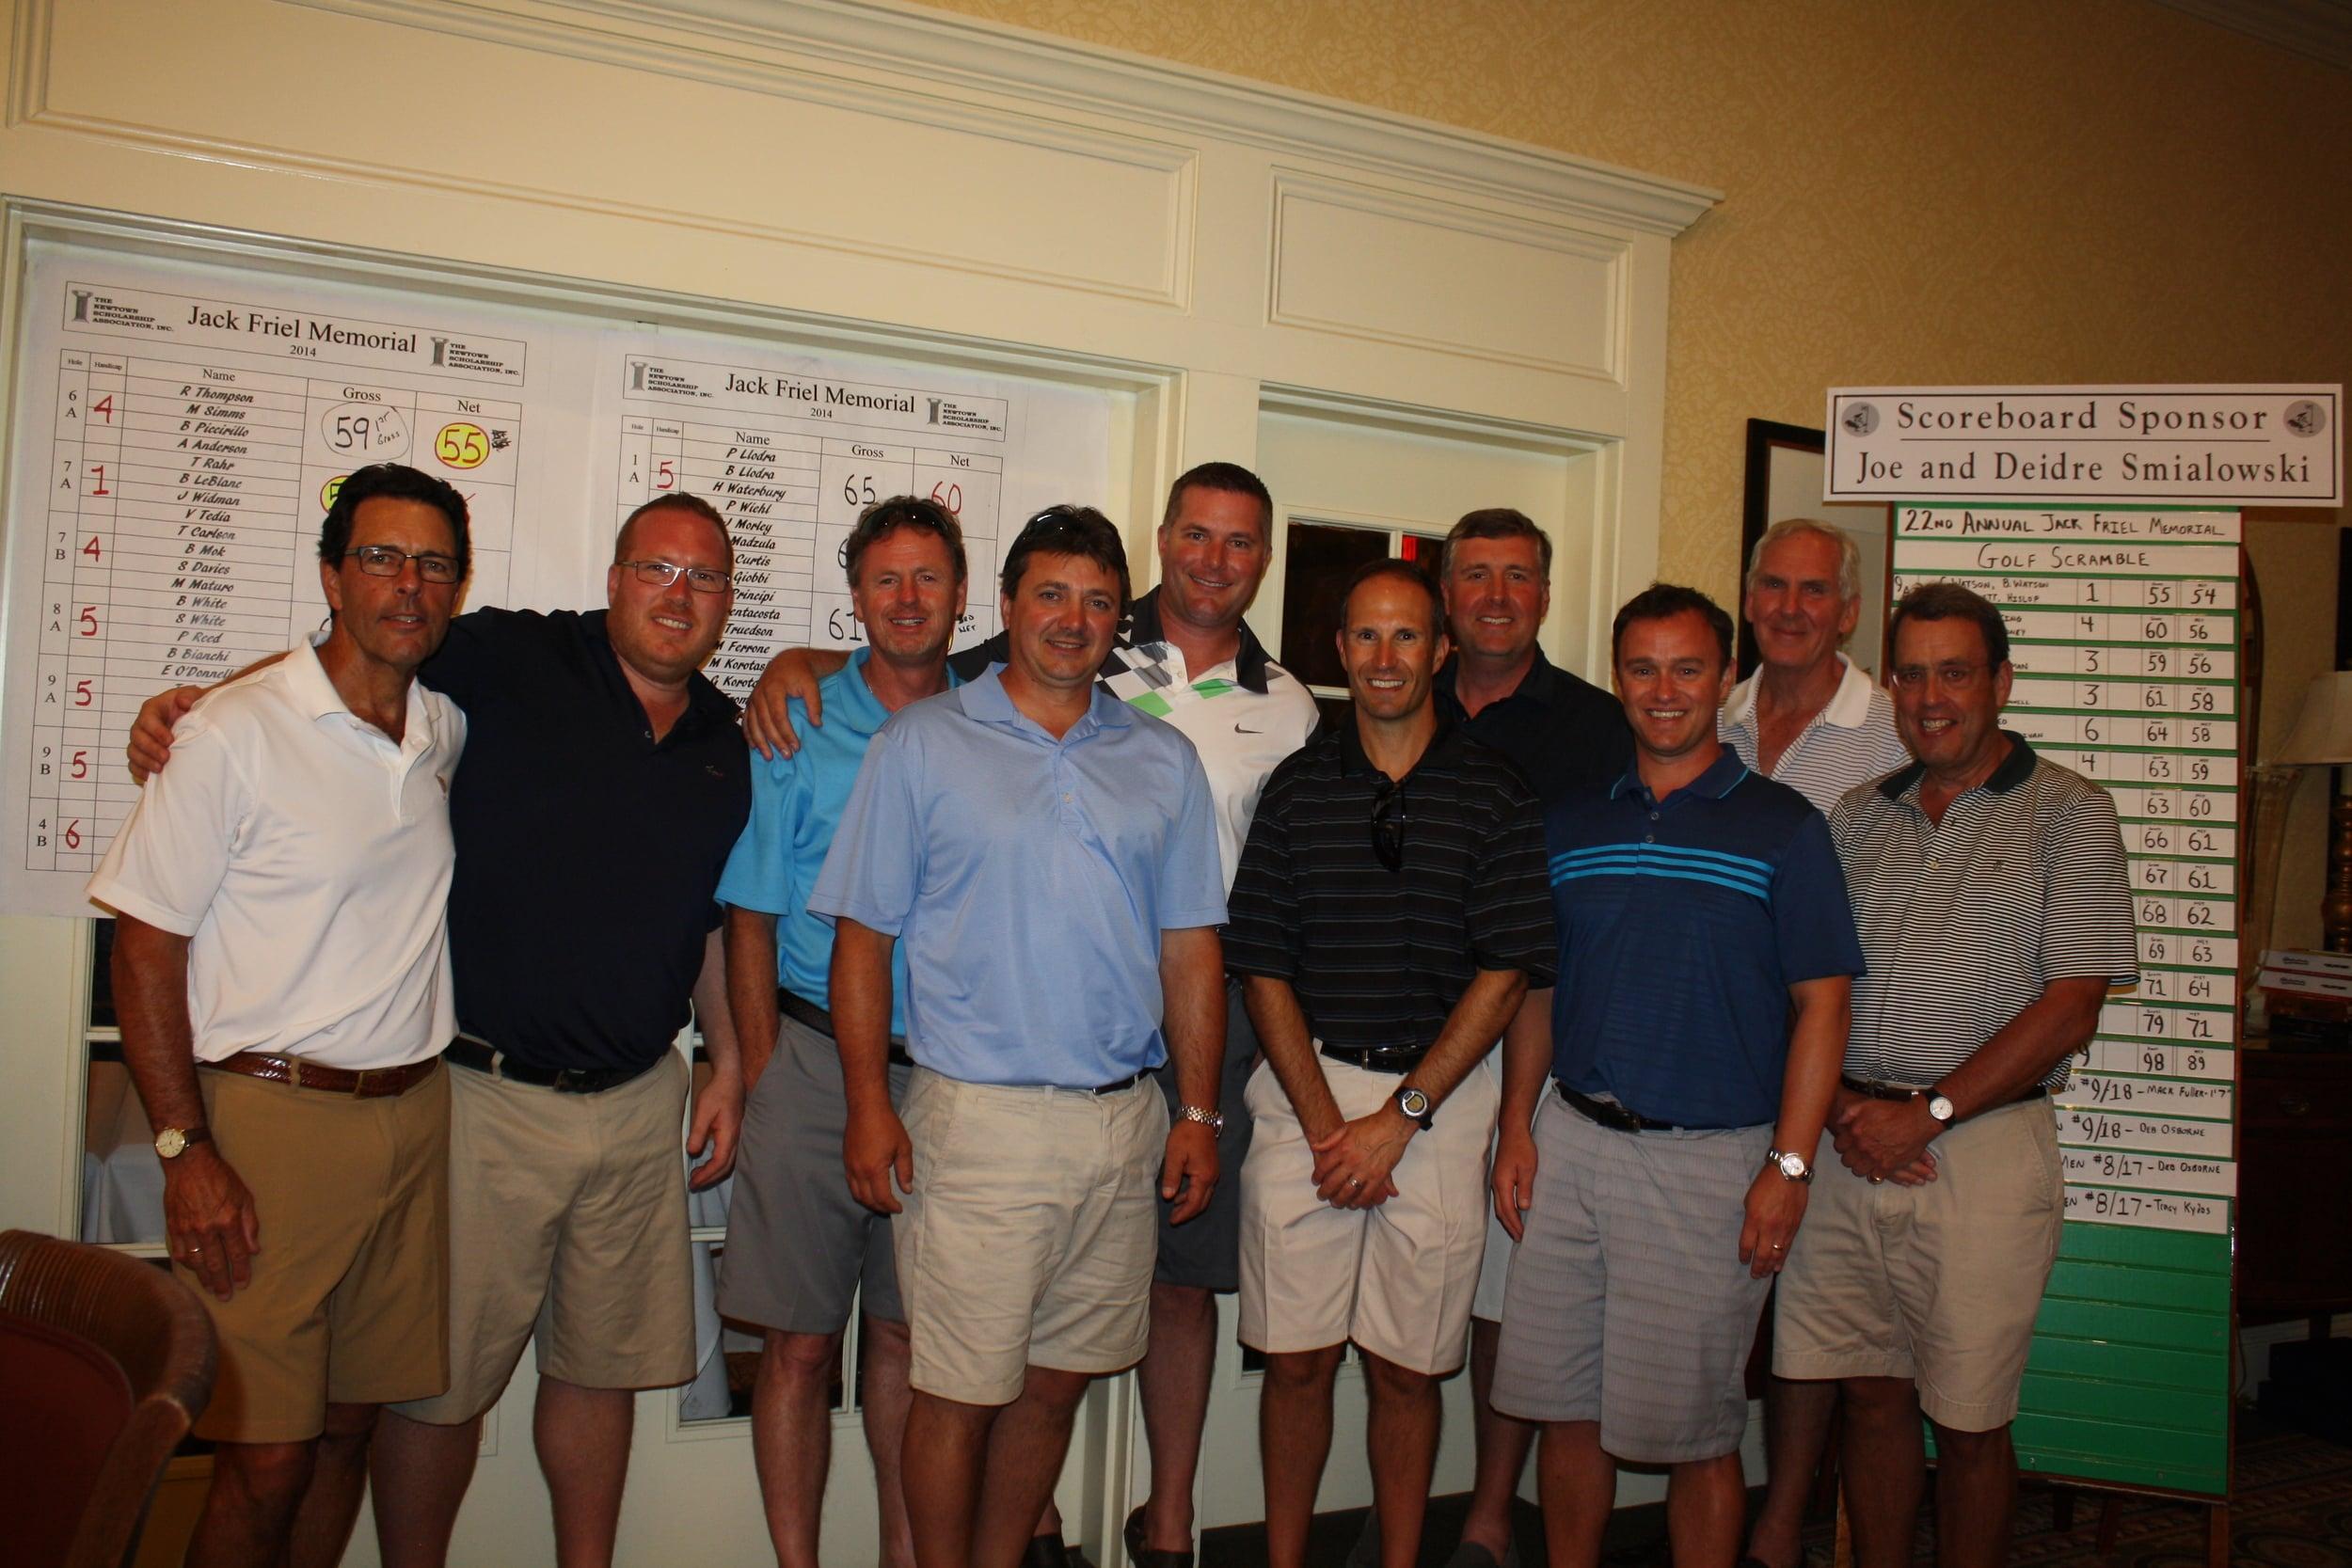 061614 rrcc ncc golf winners 5488.JPG